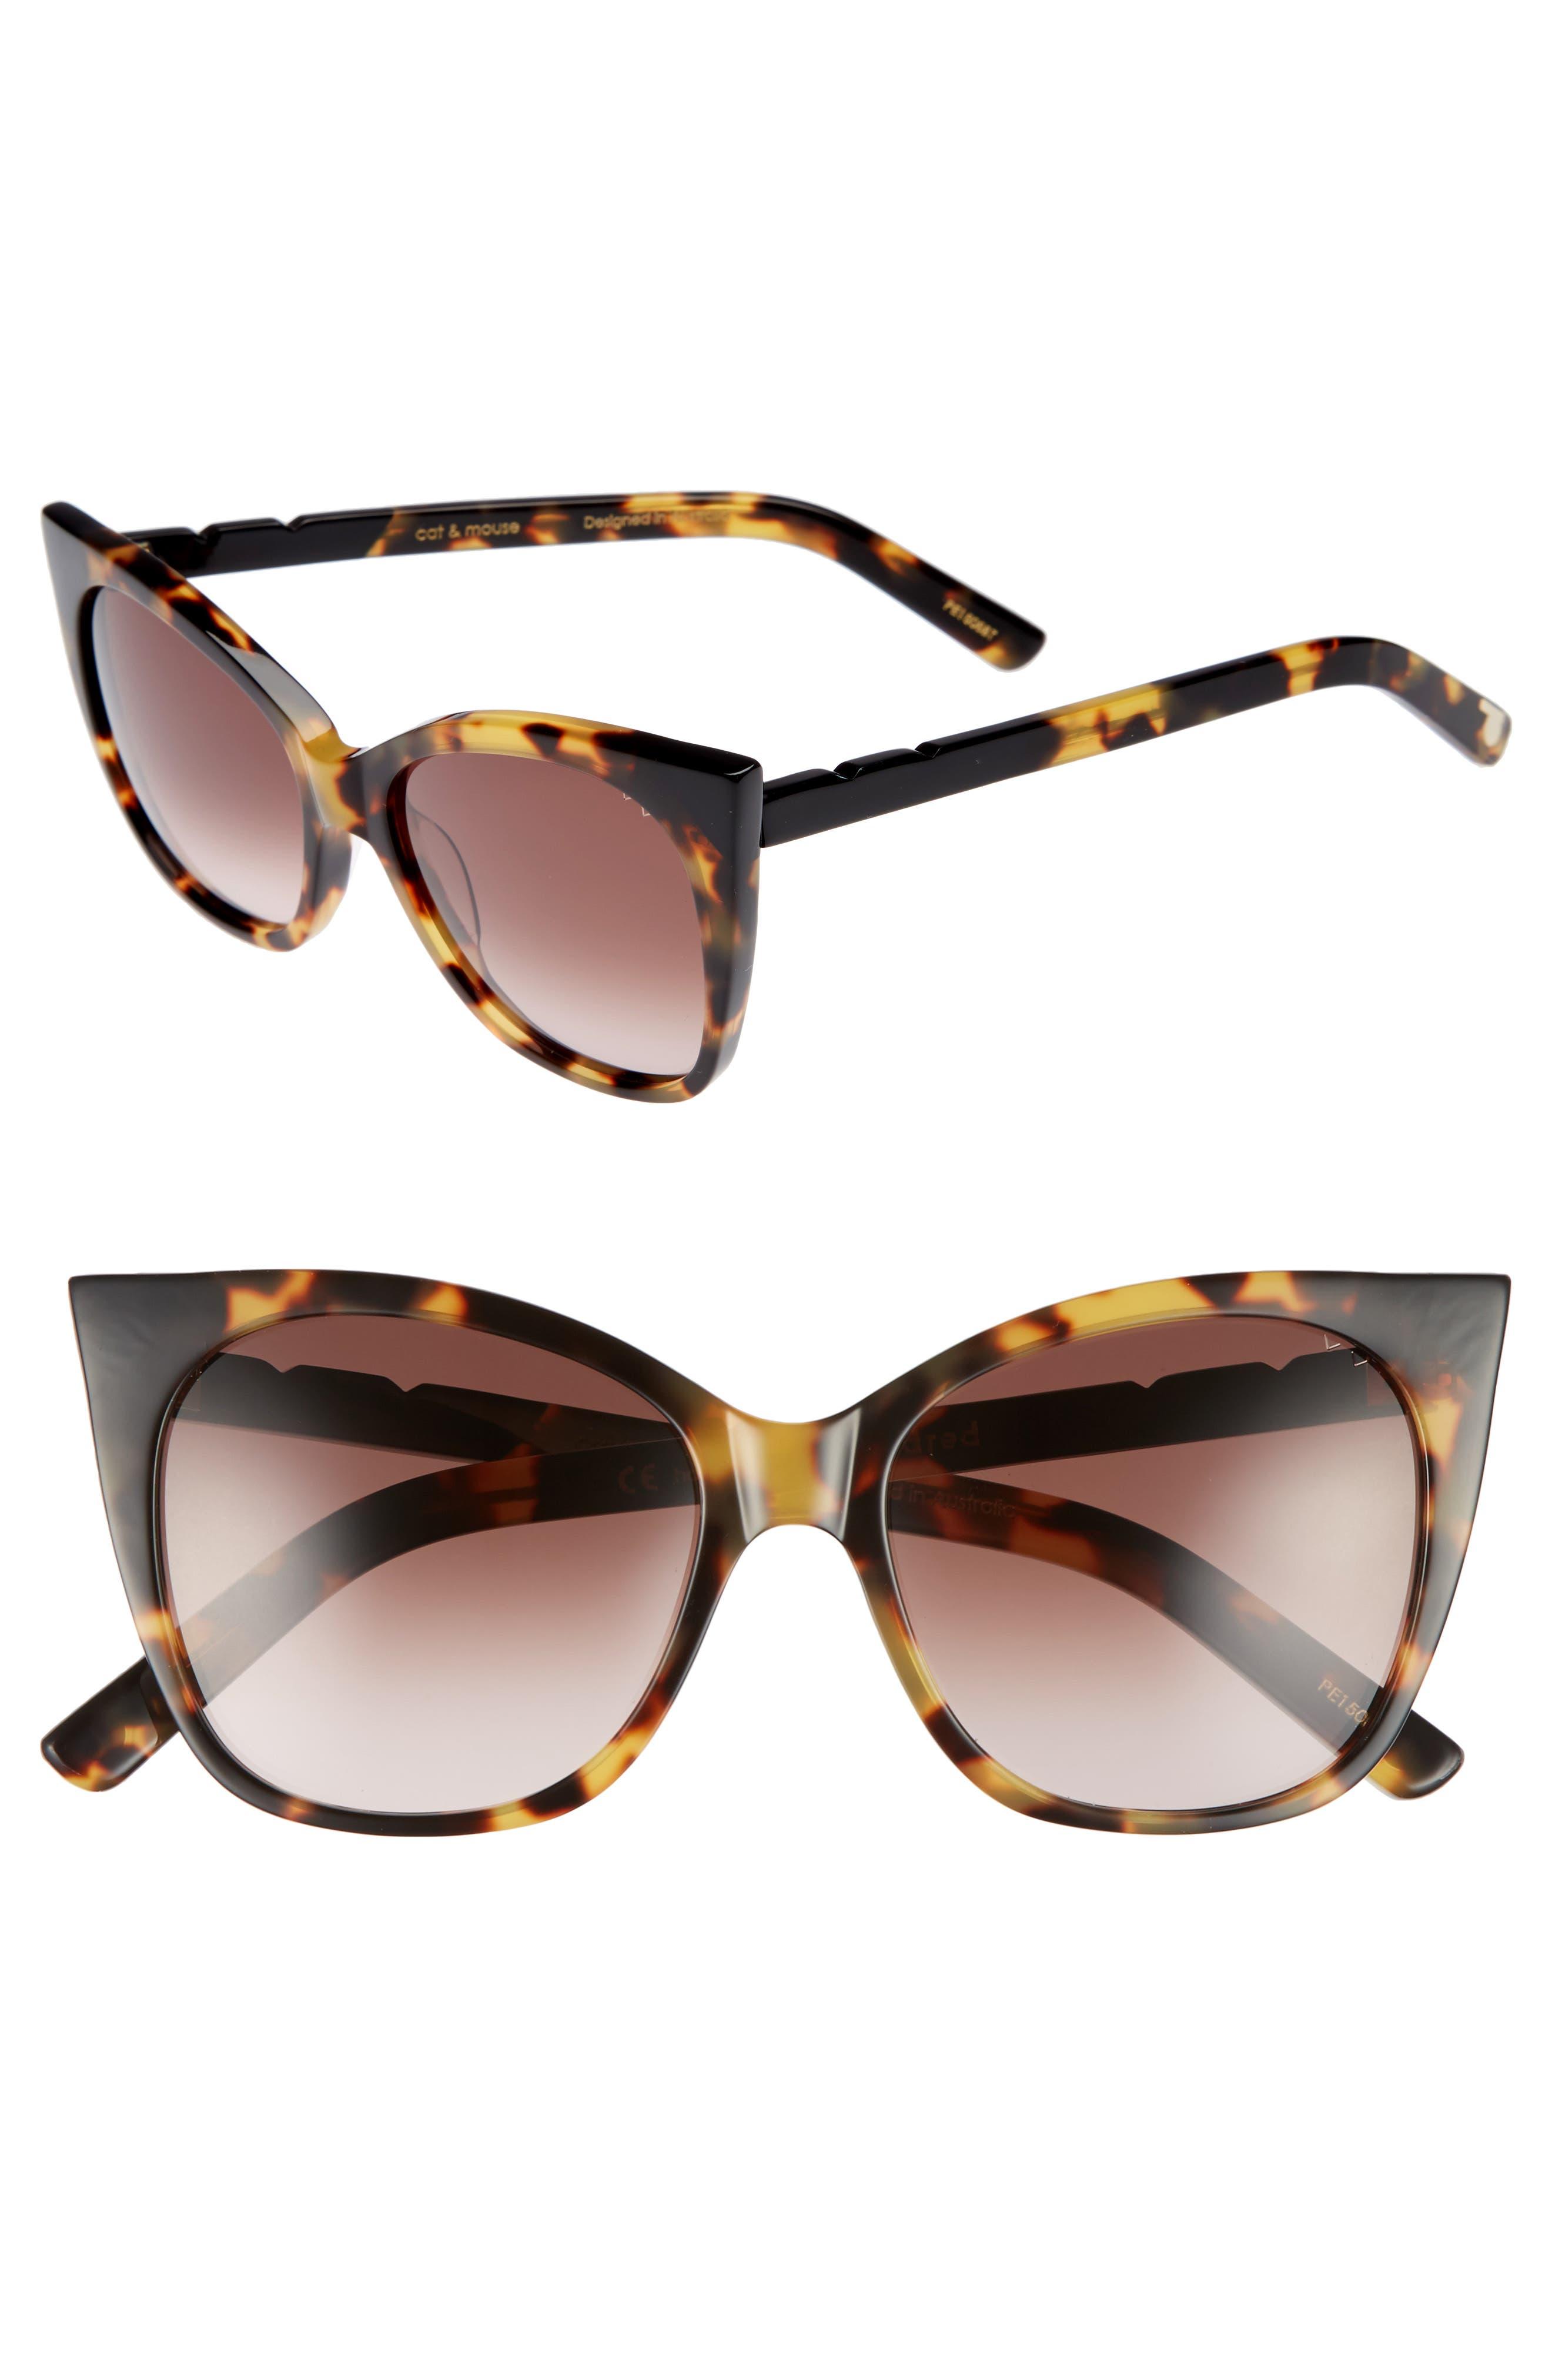 Cat & Mouse 51mm Cat Eye Sunglasses,                             Main thumbnail 1, color,                             DARK TORTOISE/ BLACK BROWN